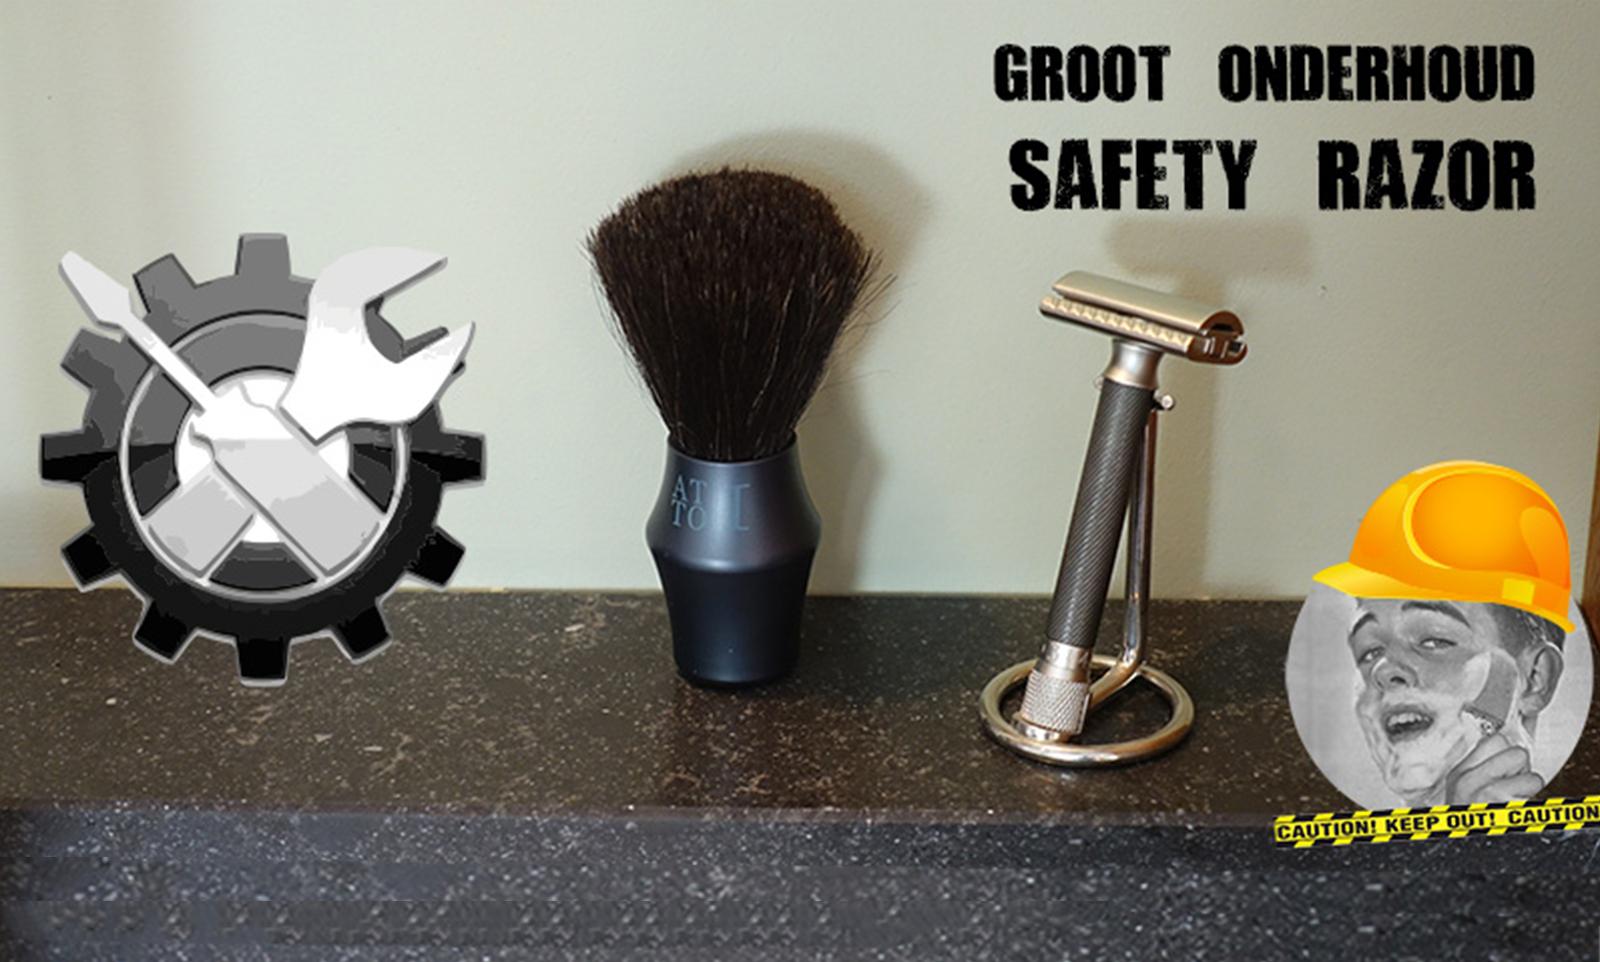 20-10-2017-Groot_onderhoud_safety_razor-web